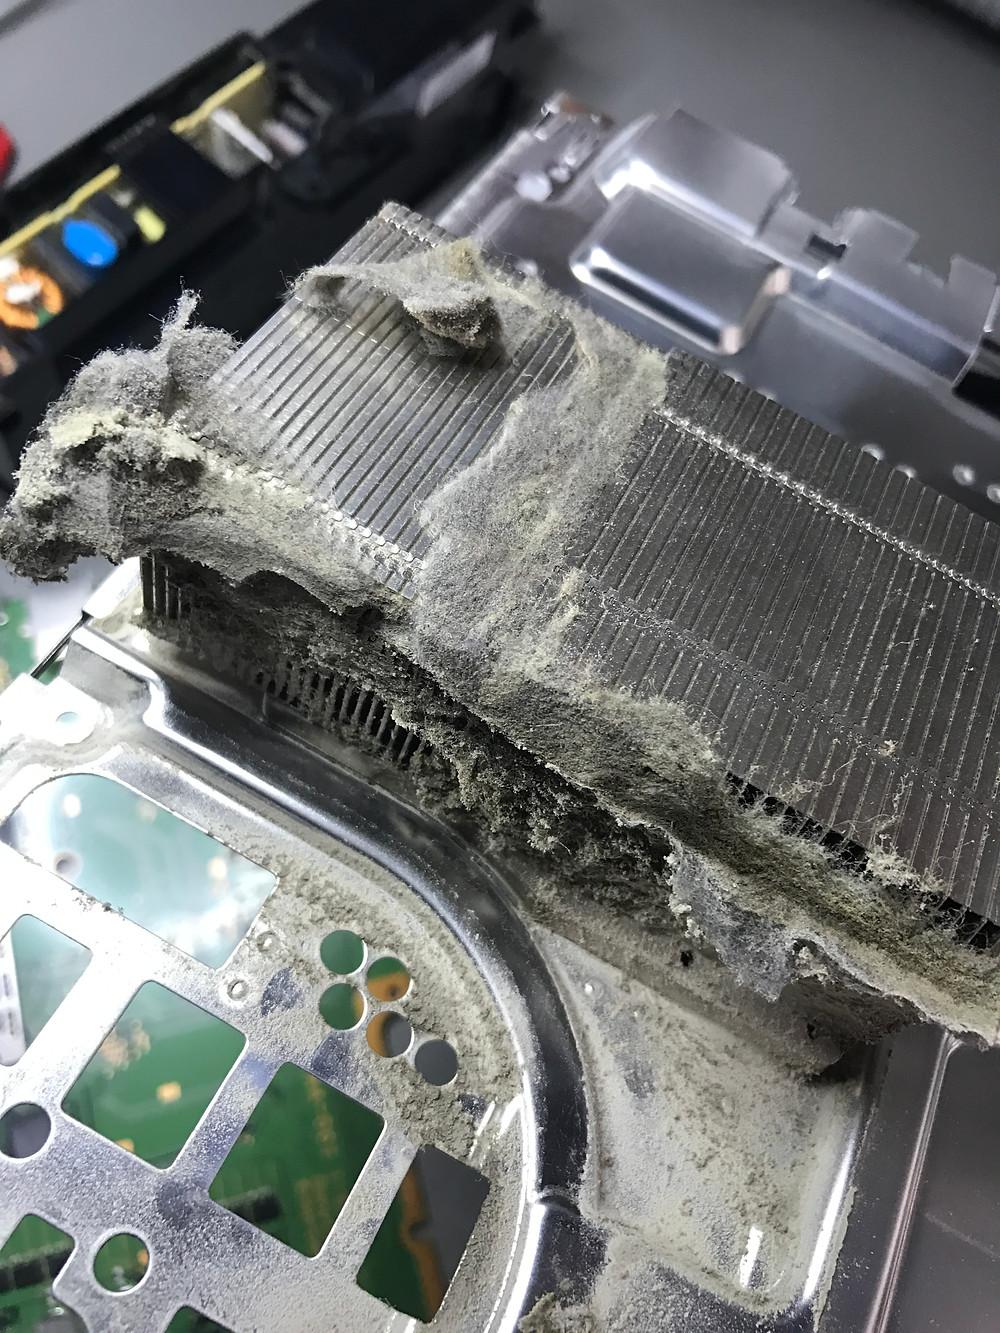 PS4 Kühler verstaubt